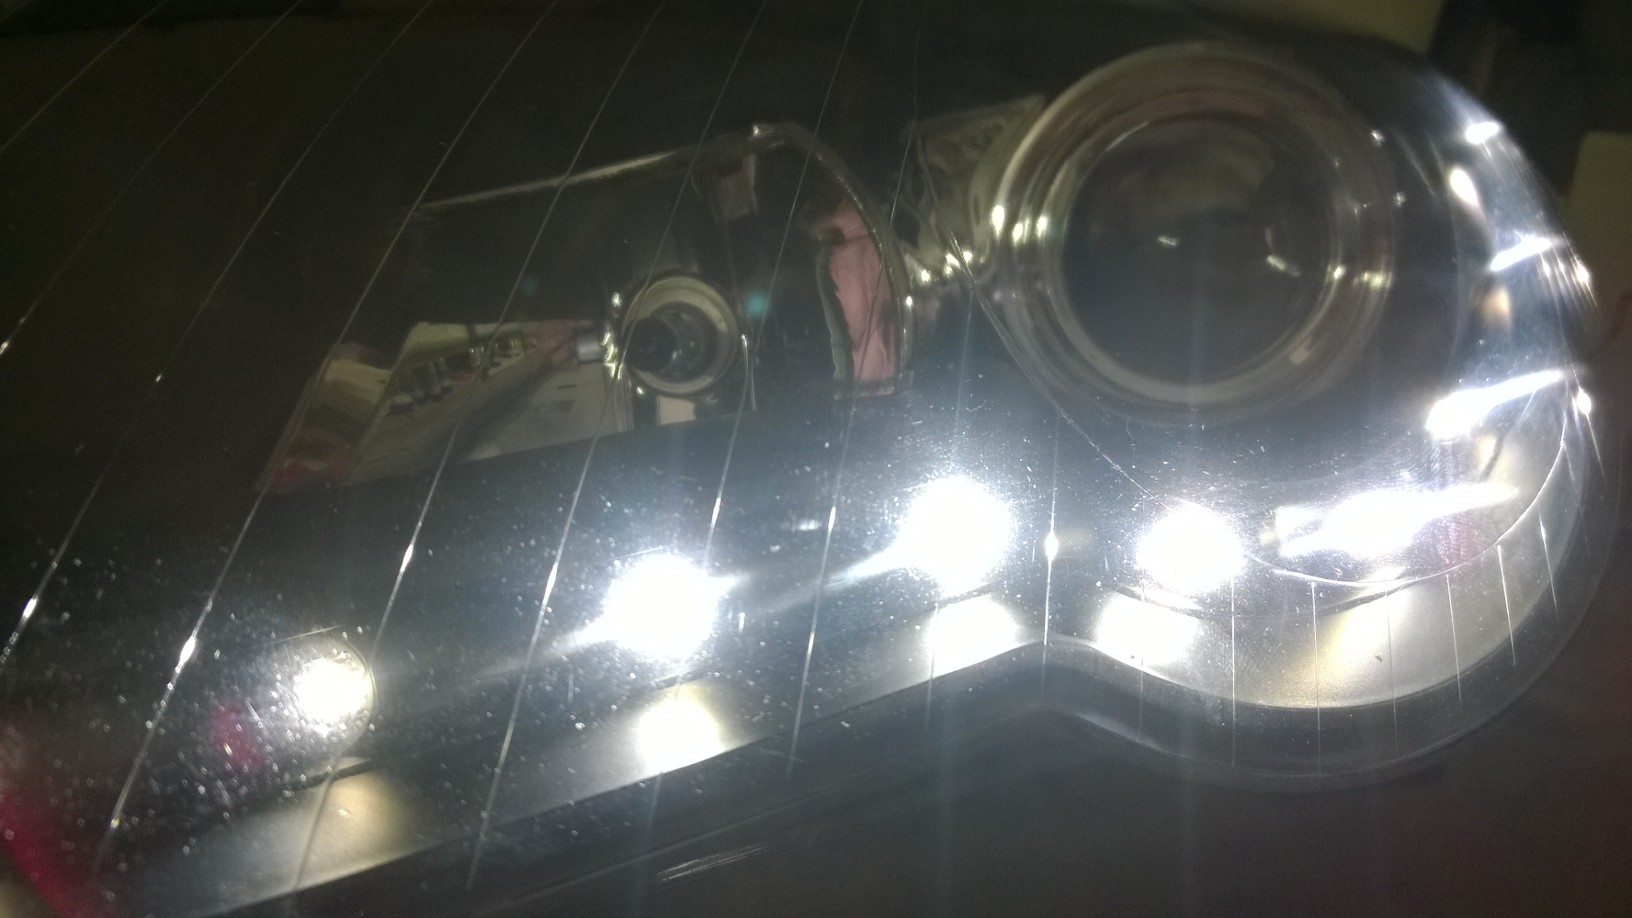 Reparatur von lampen przednich vw passat b6 drl depo for Lampen reparatur